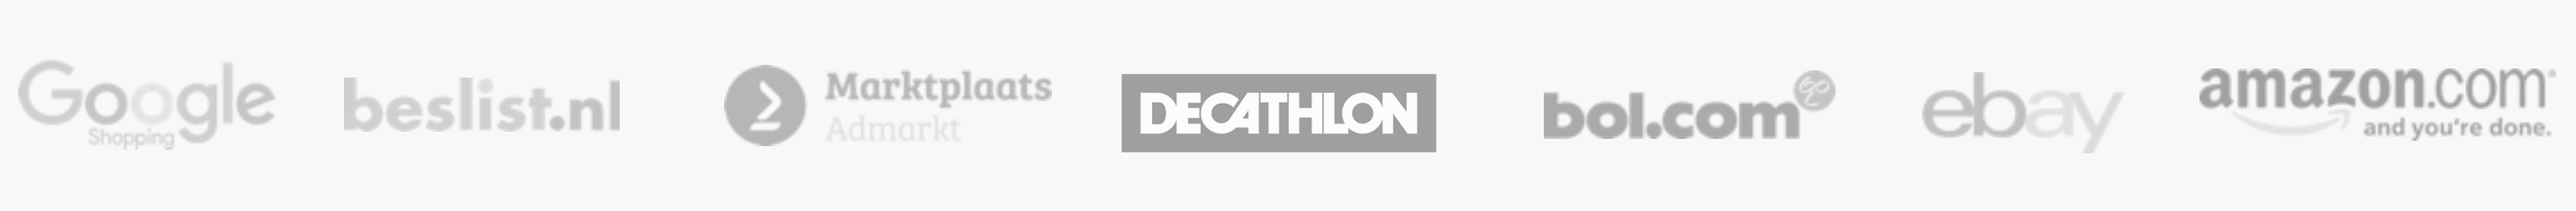 Marketplaces platforms - bol.com, amazon, decathlon, ebay,...